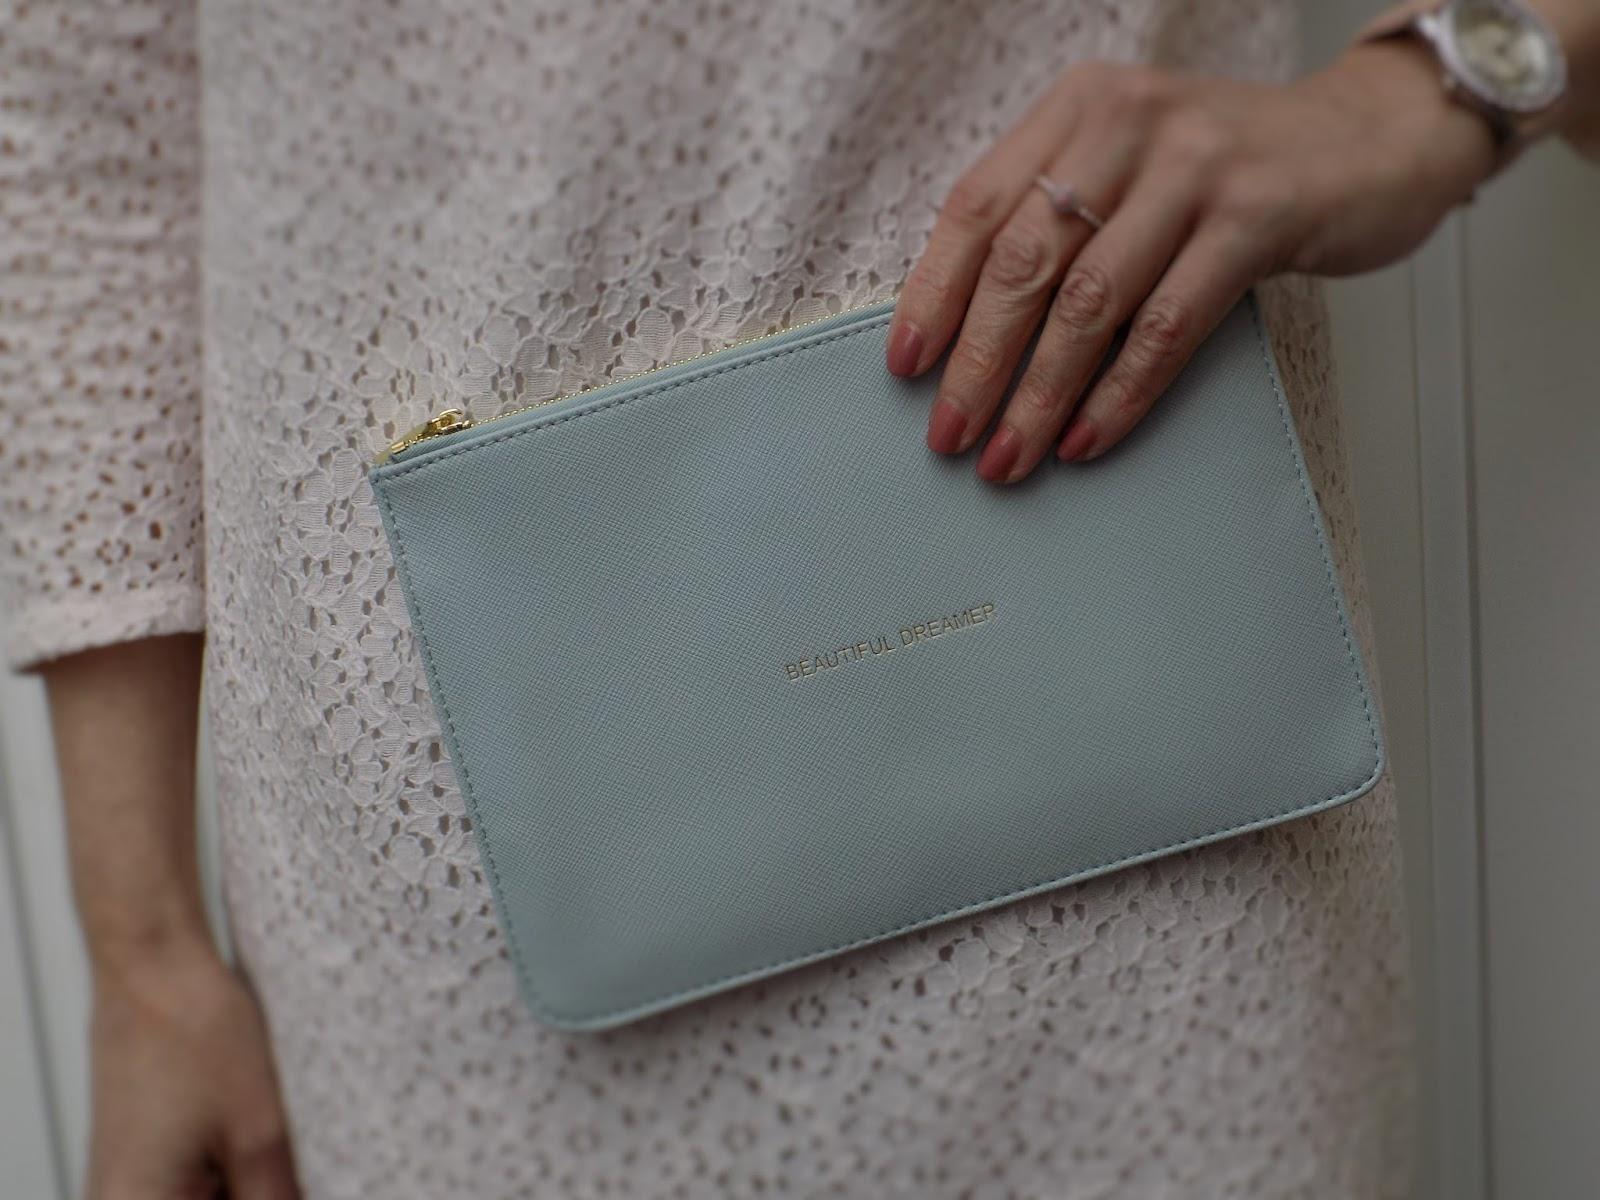 Katie Loxton Beautiful Dreamer pouch